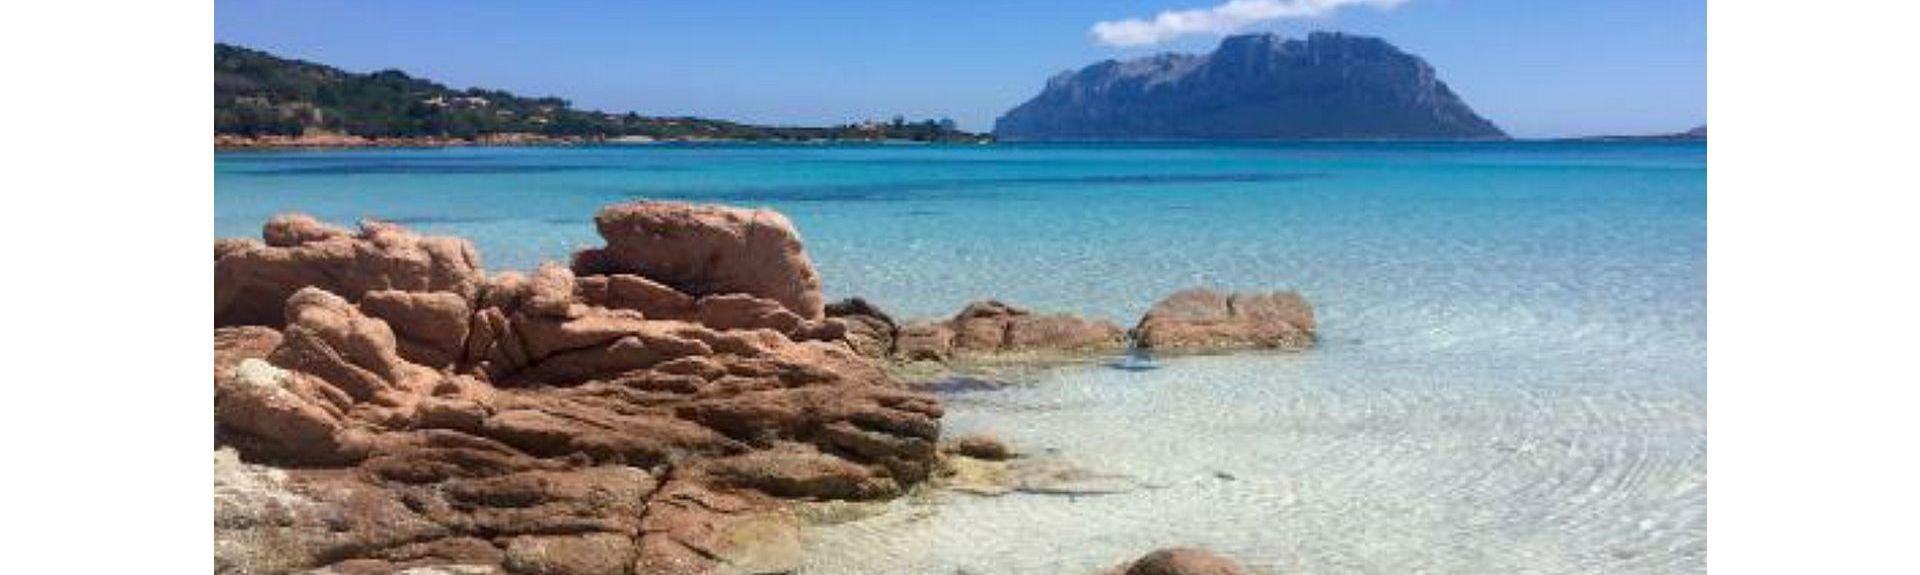 Berchidda, Sardinia, Italy